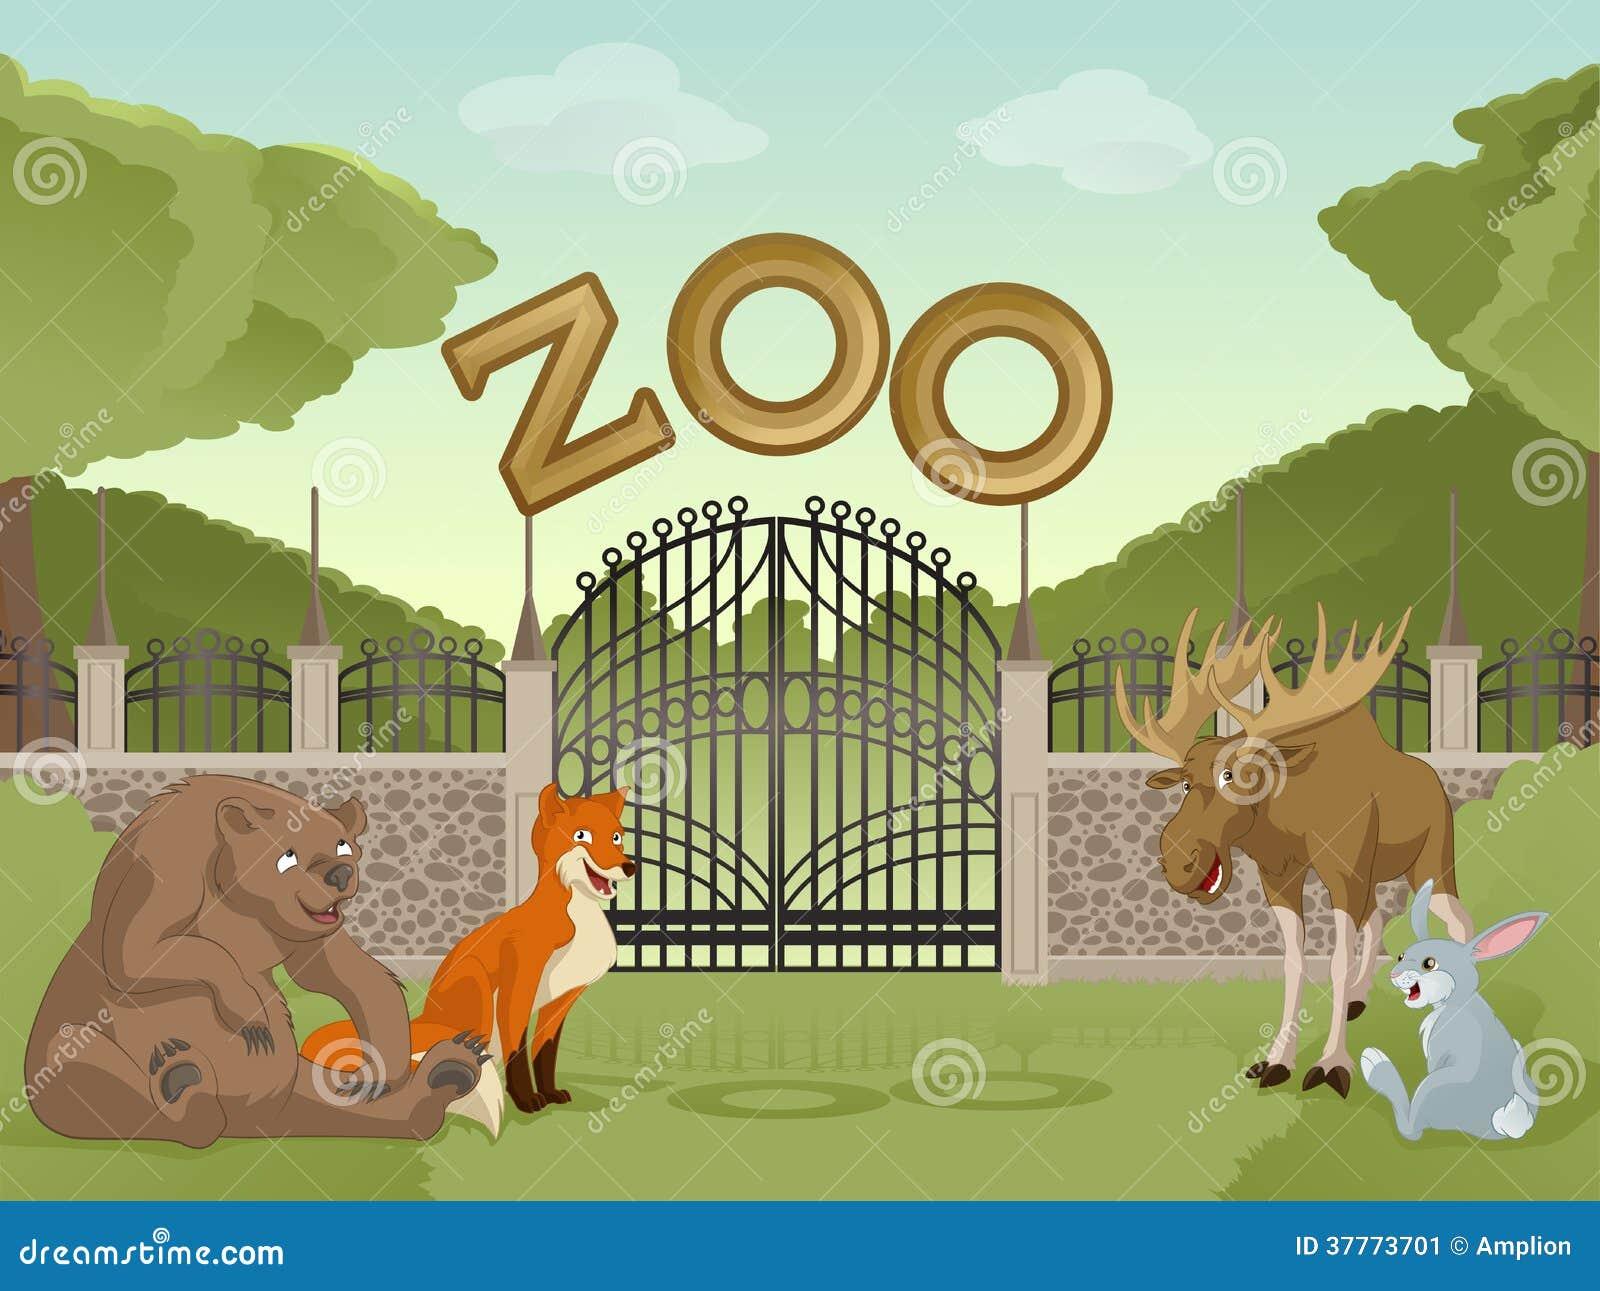 Zoo With Cartoon Animals Stock Vector Illustration Of